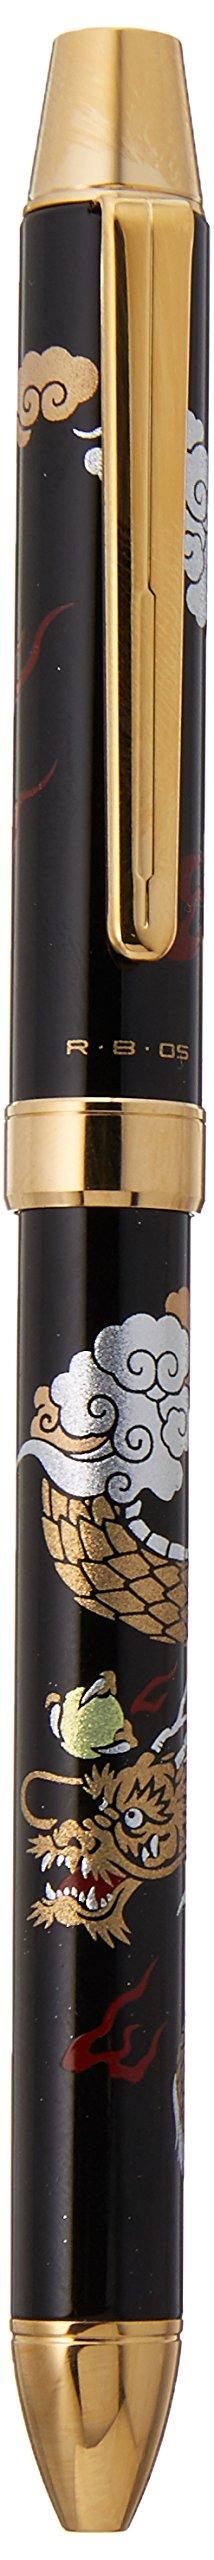 Pilot Mechanical Pencil, 0.5mm + Ballpoint Pen, 0.7mm, Fine, Black and Red, 2+1 Miyabi Emaki, Dragon (BTHM-5SR-R)